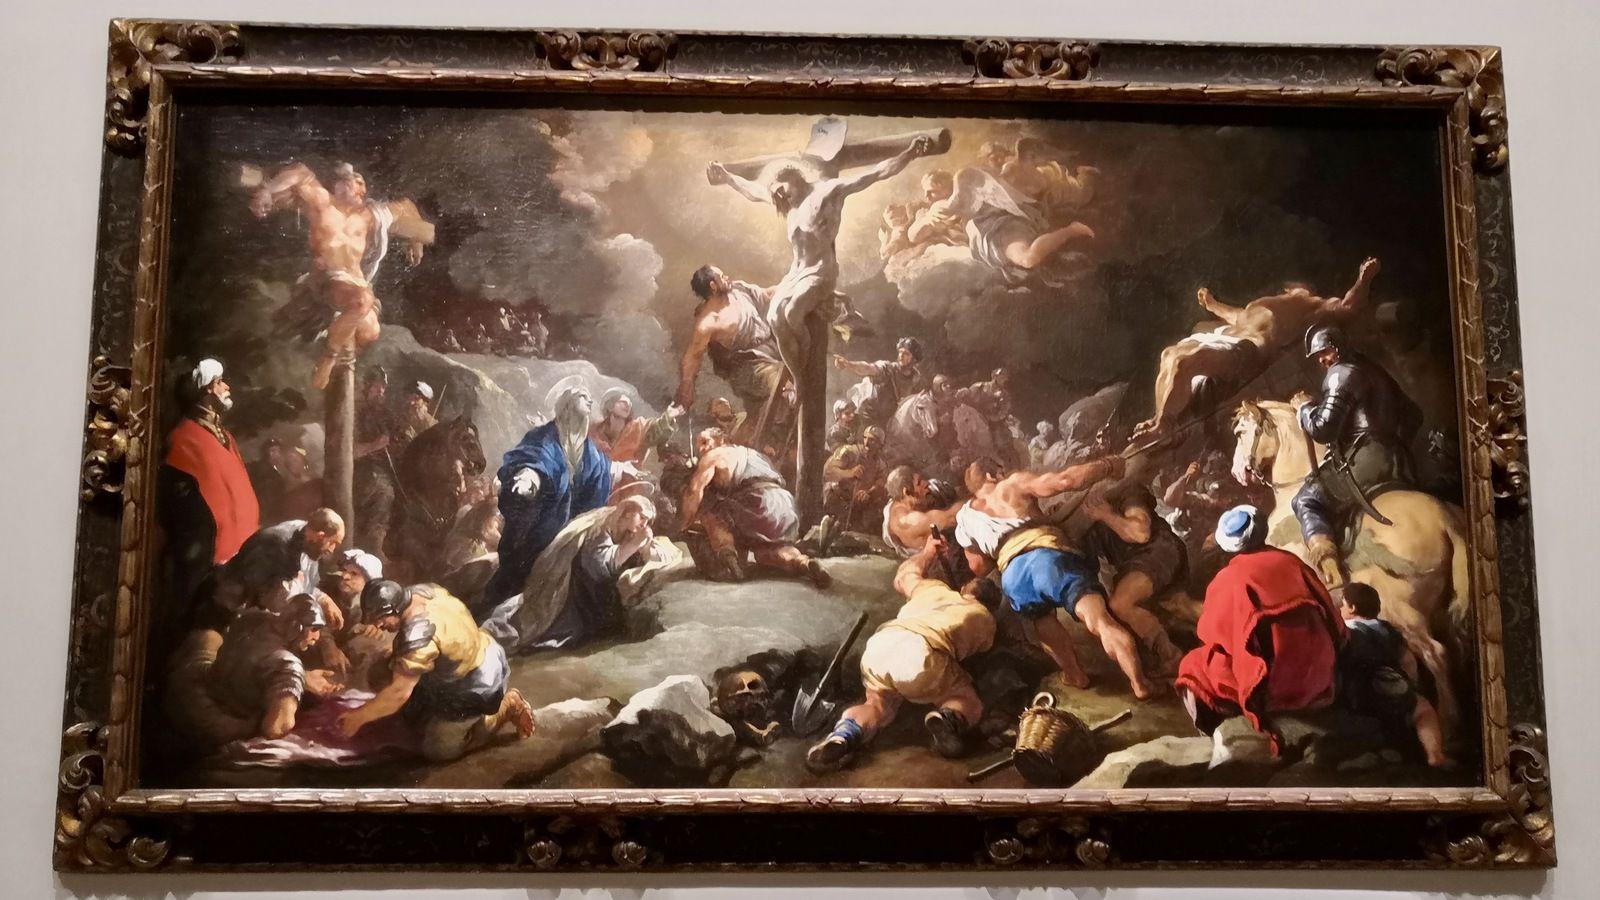 Luca Giordano, le Calvaire, Huile sur toile, Tolède, Madrid, Fondo cultural Villar-Mir